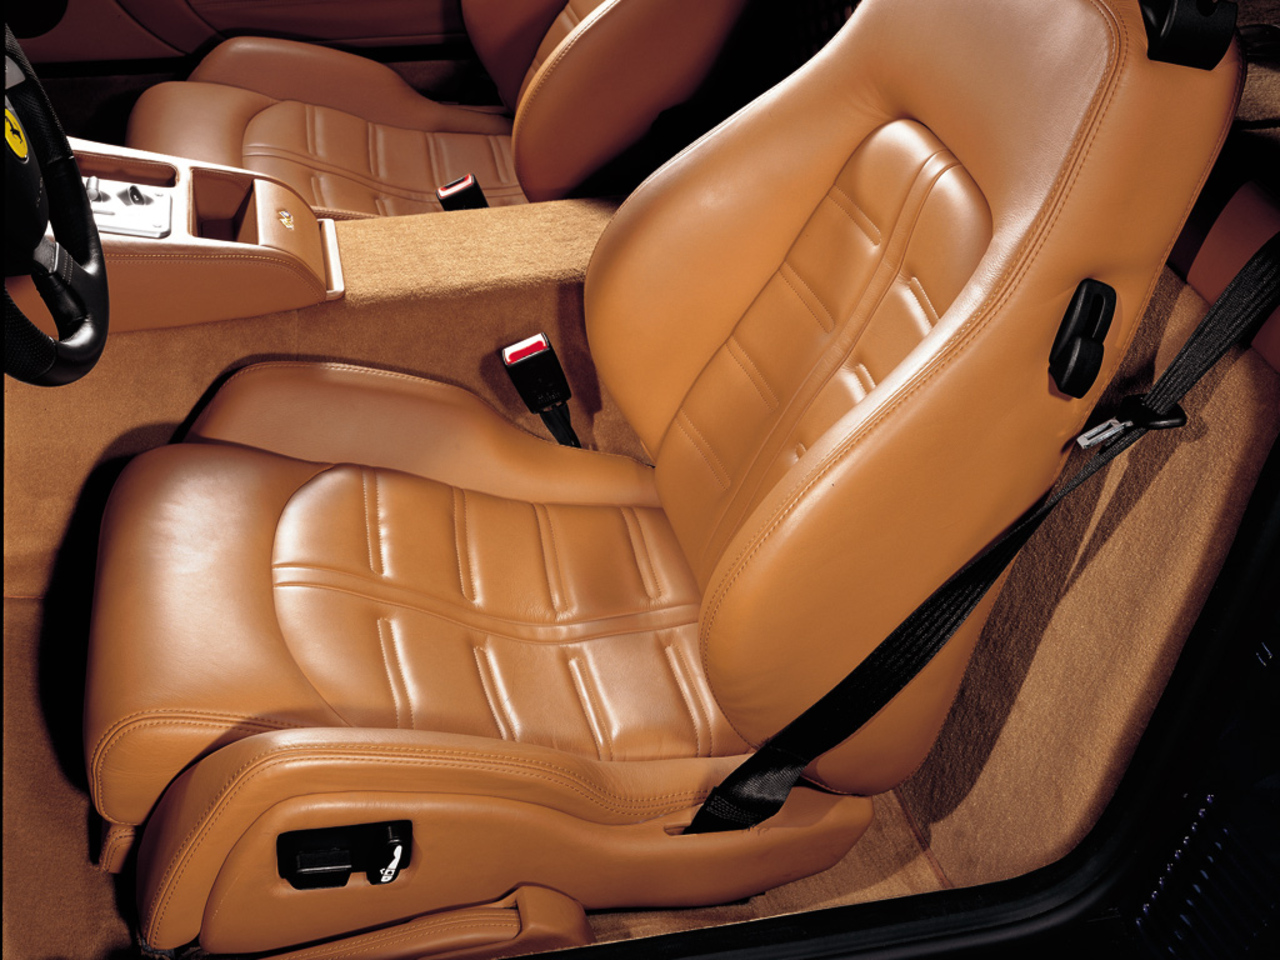 575M Maranello, leather seat